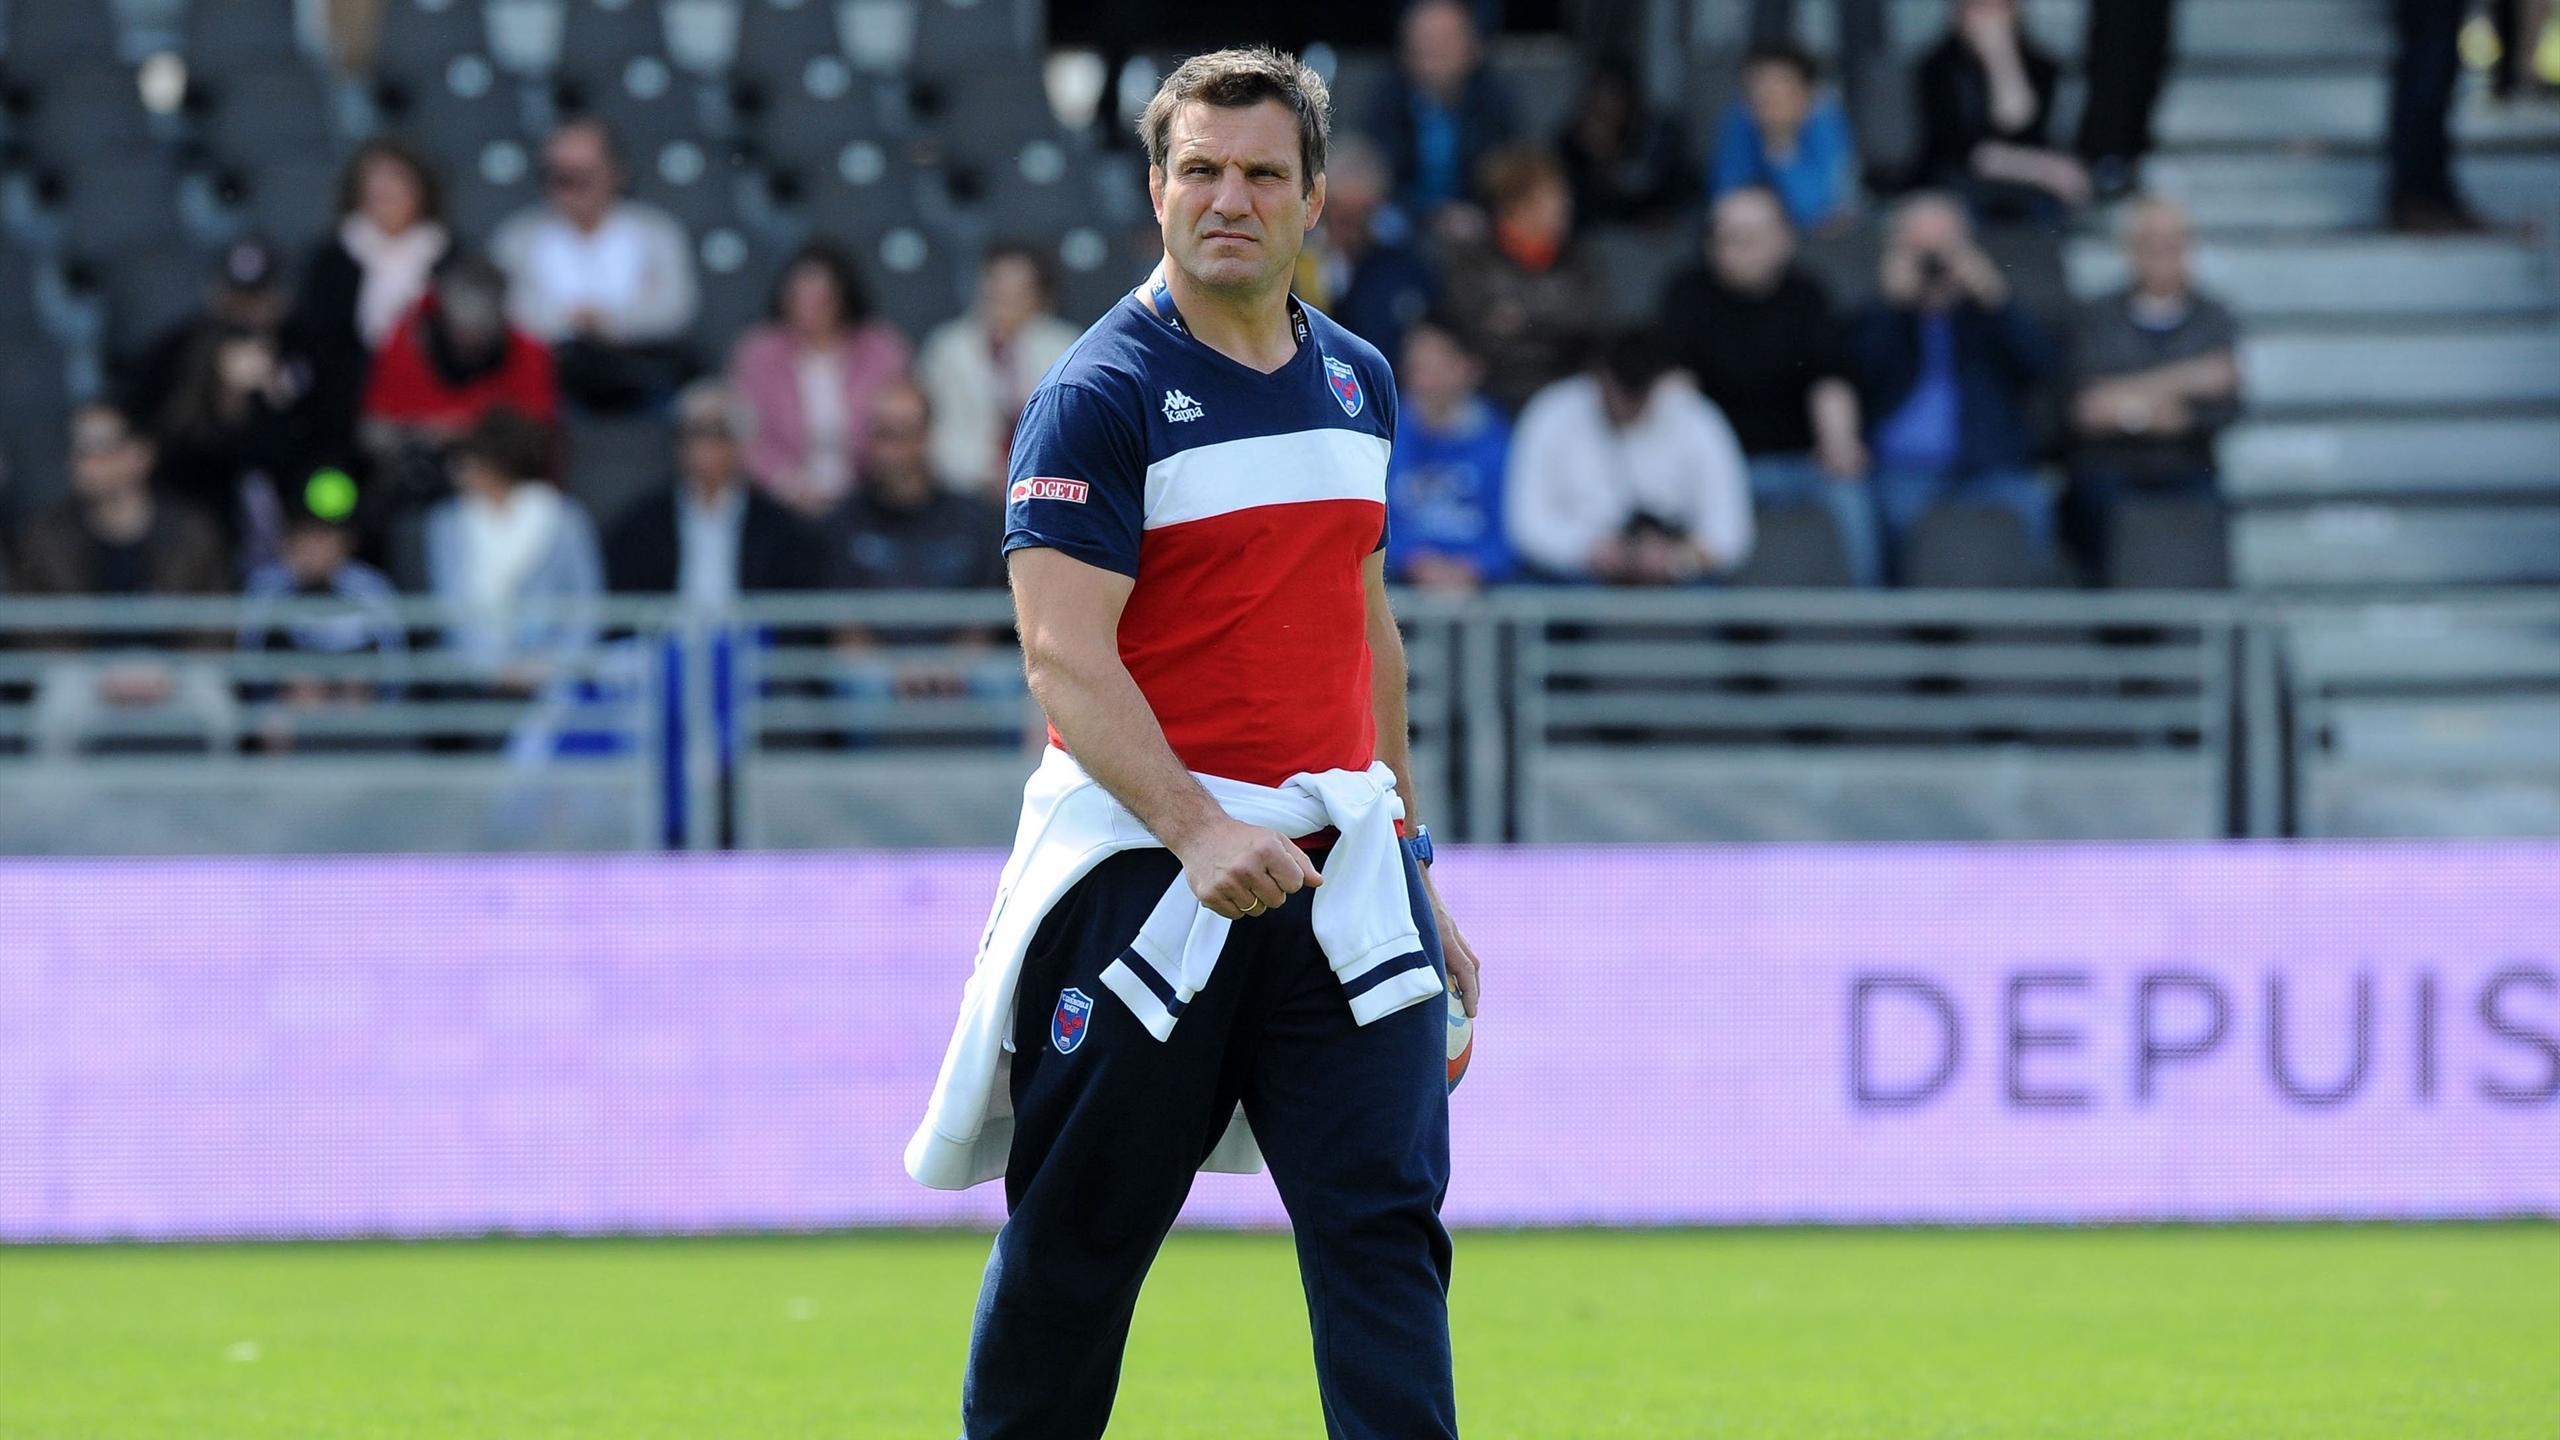 Fabrice Landreau (Grenoble) face à Lyon - 23 mai 2015